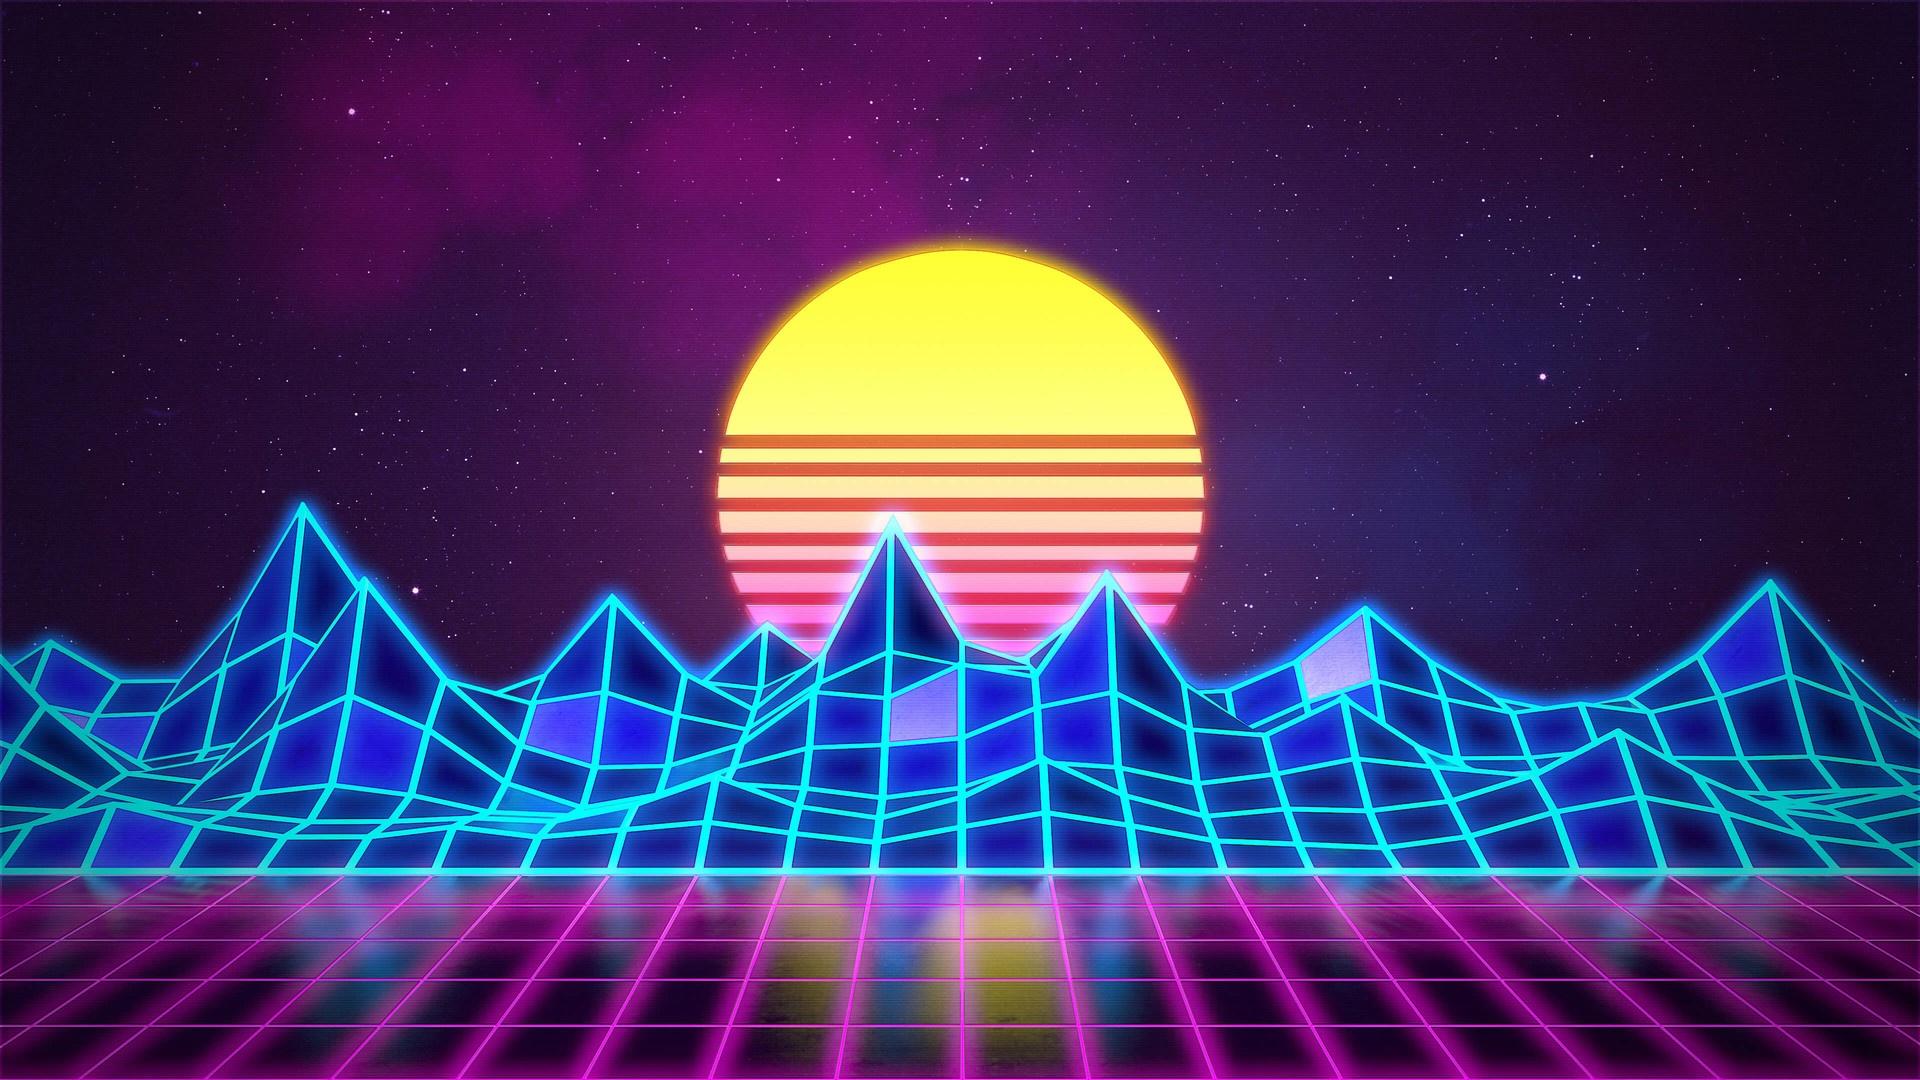 Neon free image